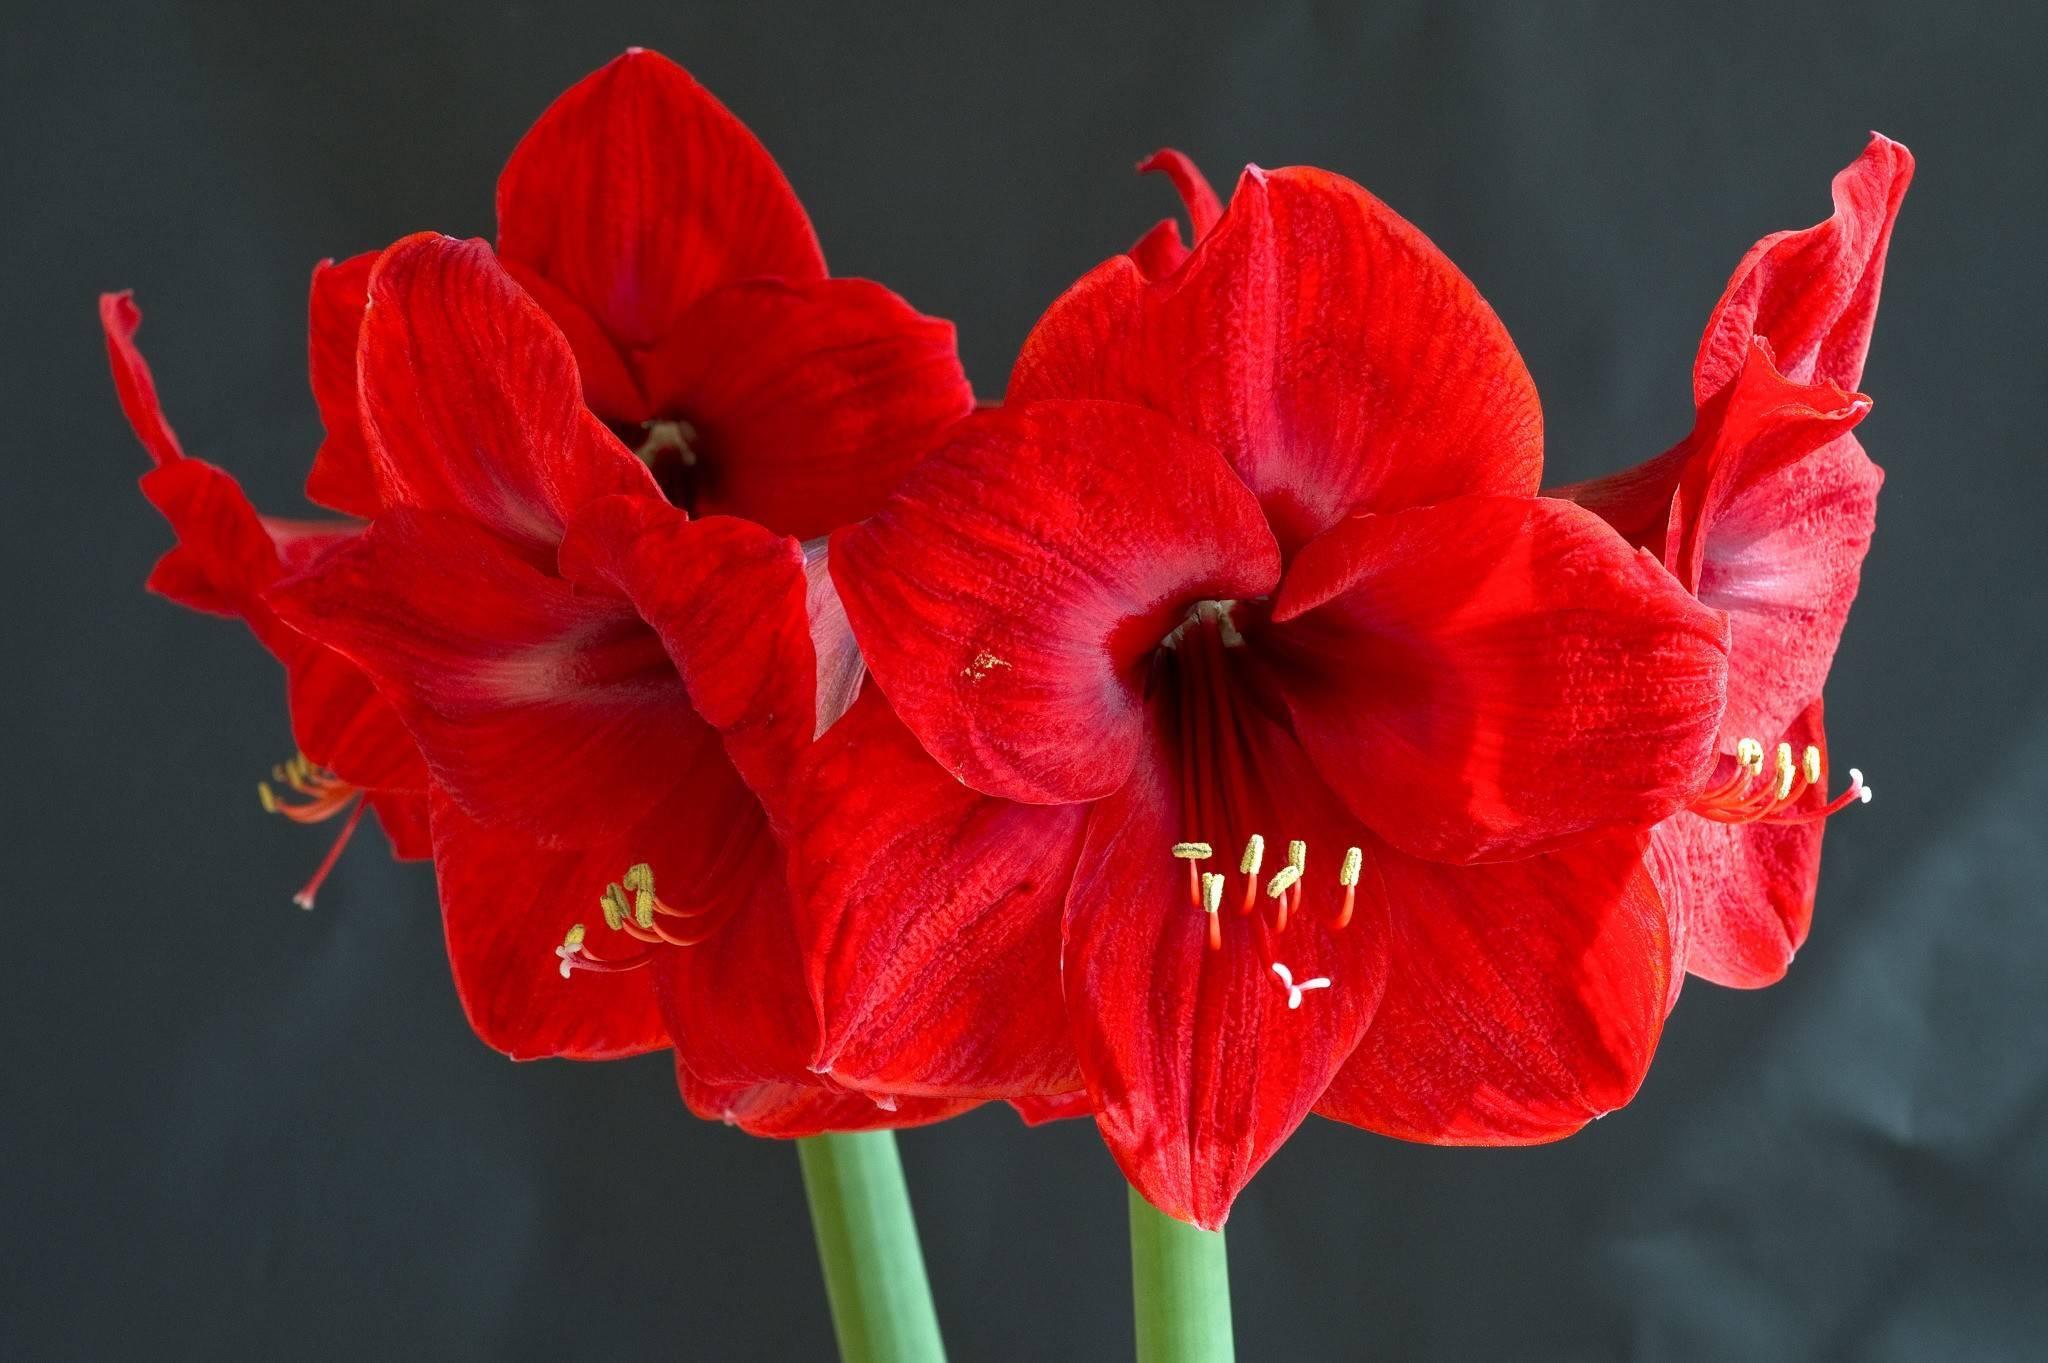 Цветок эустома (лизантус): многолетняя, посадка и уход, выращивание в саду